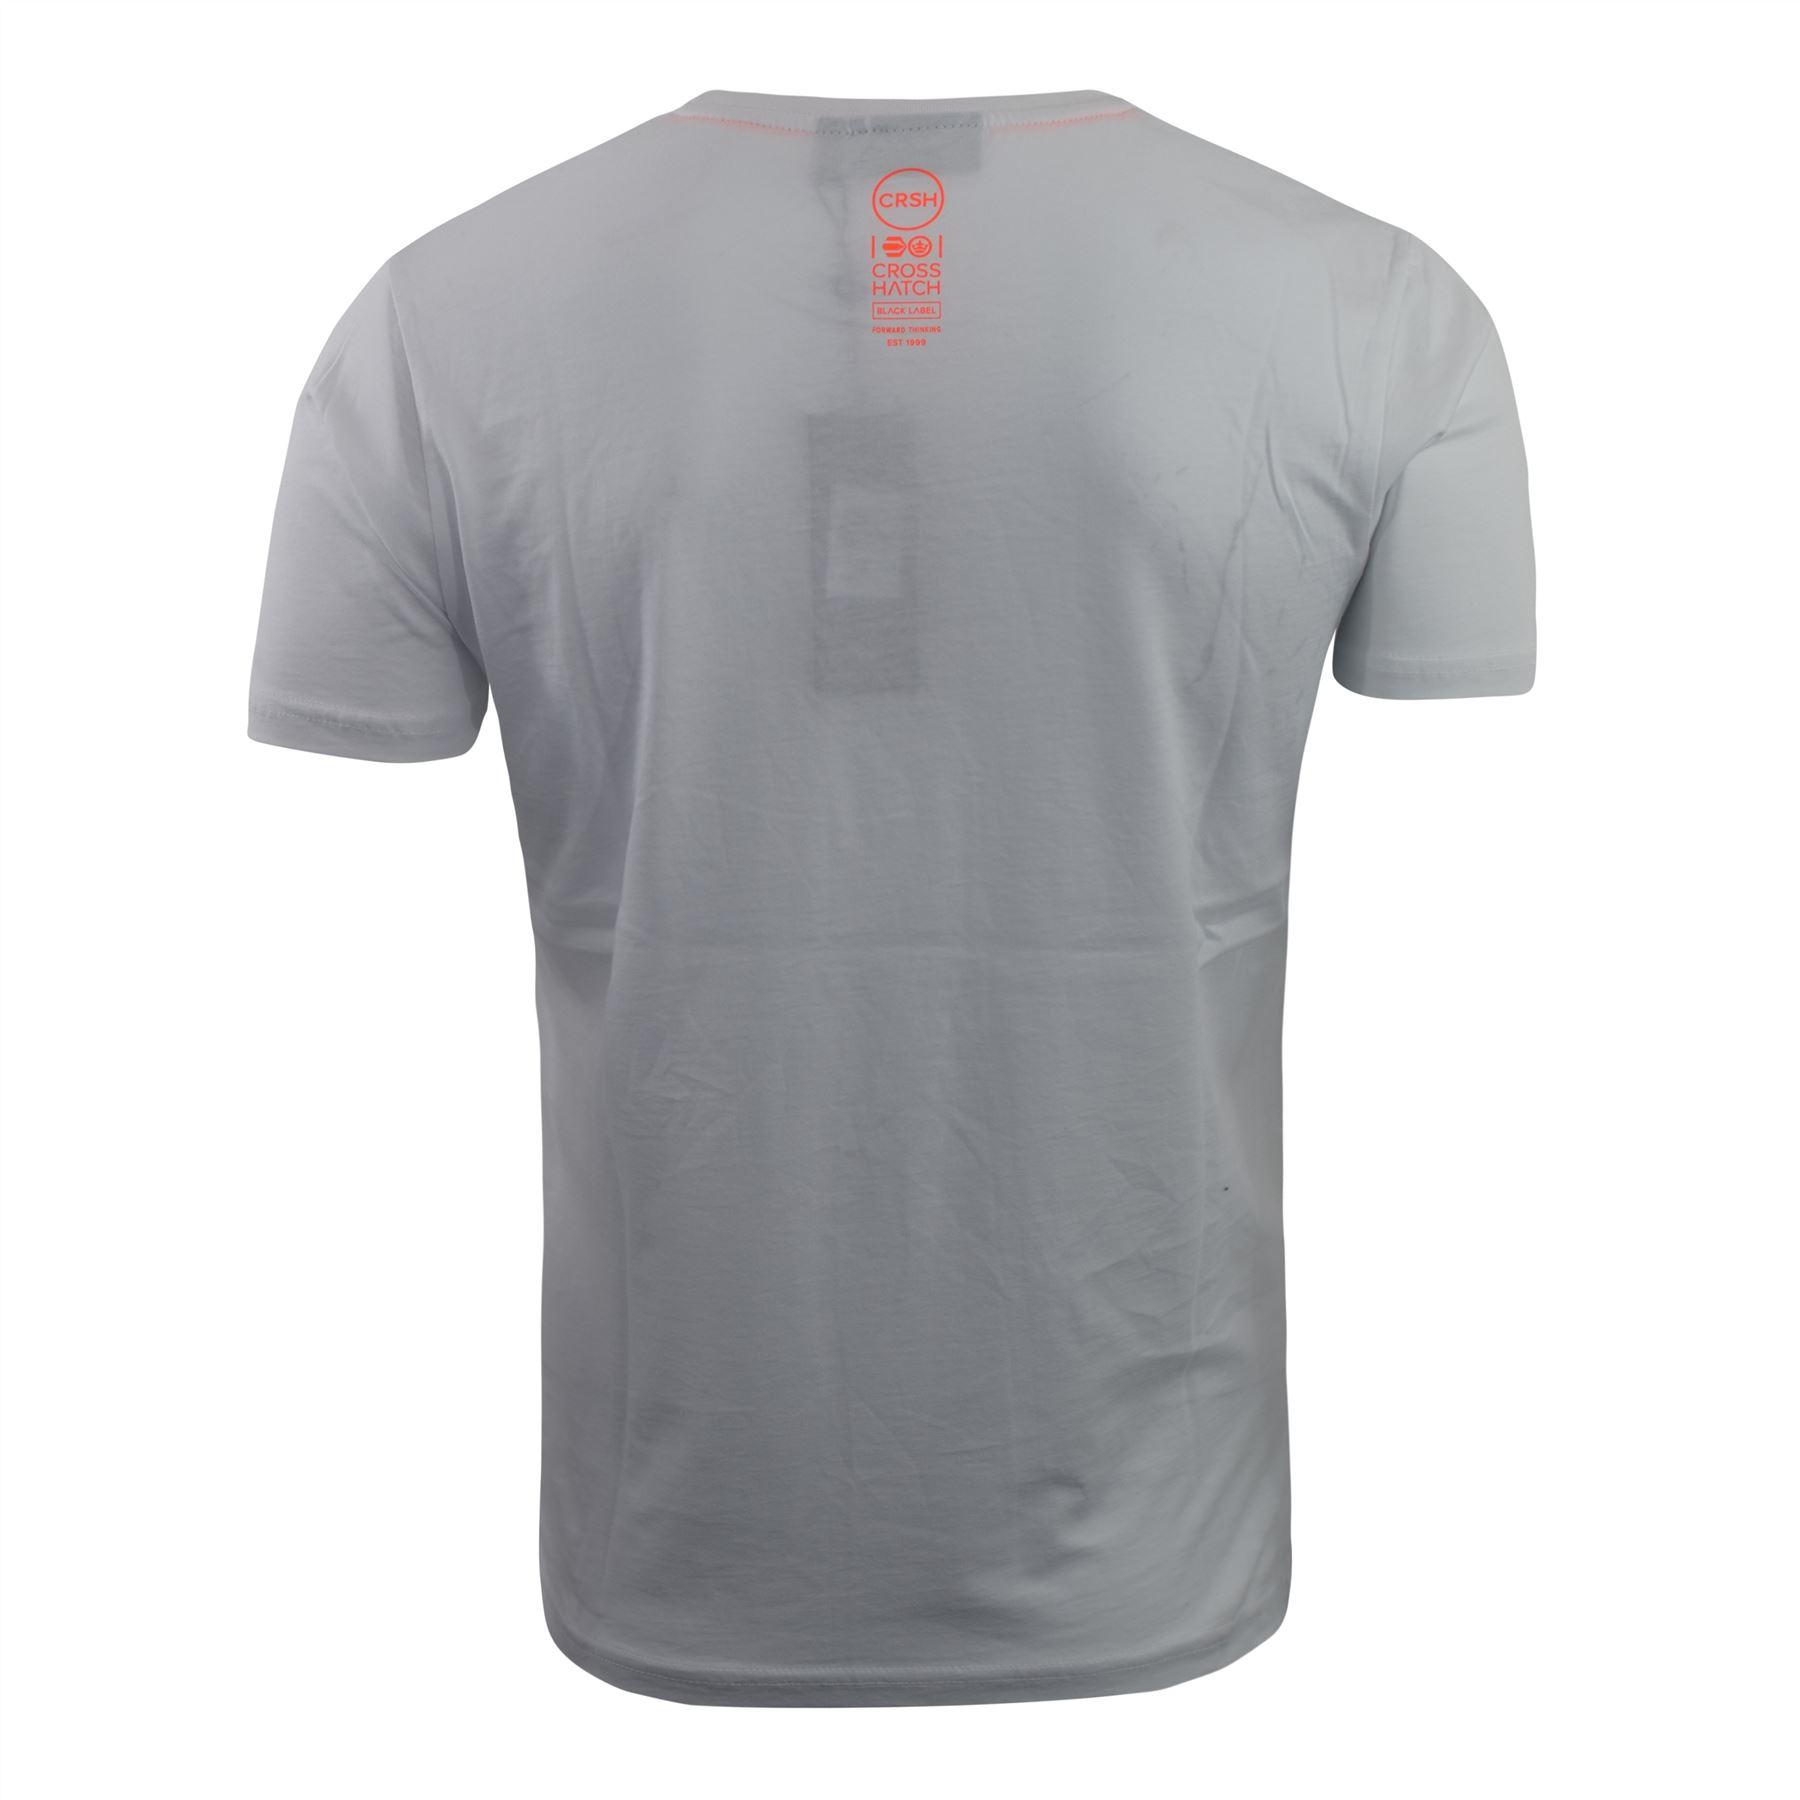 Mens-Crosshatch-T-Shirt-Graphic-Crew-Neck-Tee-Top-Kaeffmore thumbnail 10